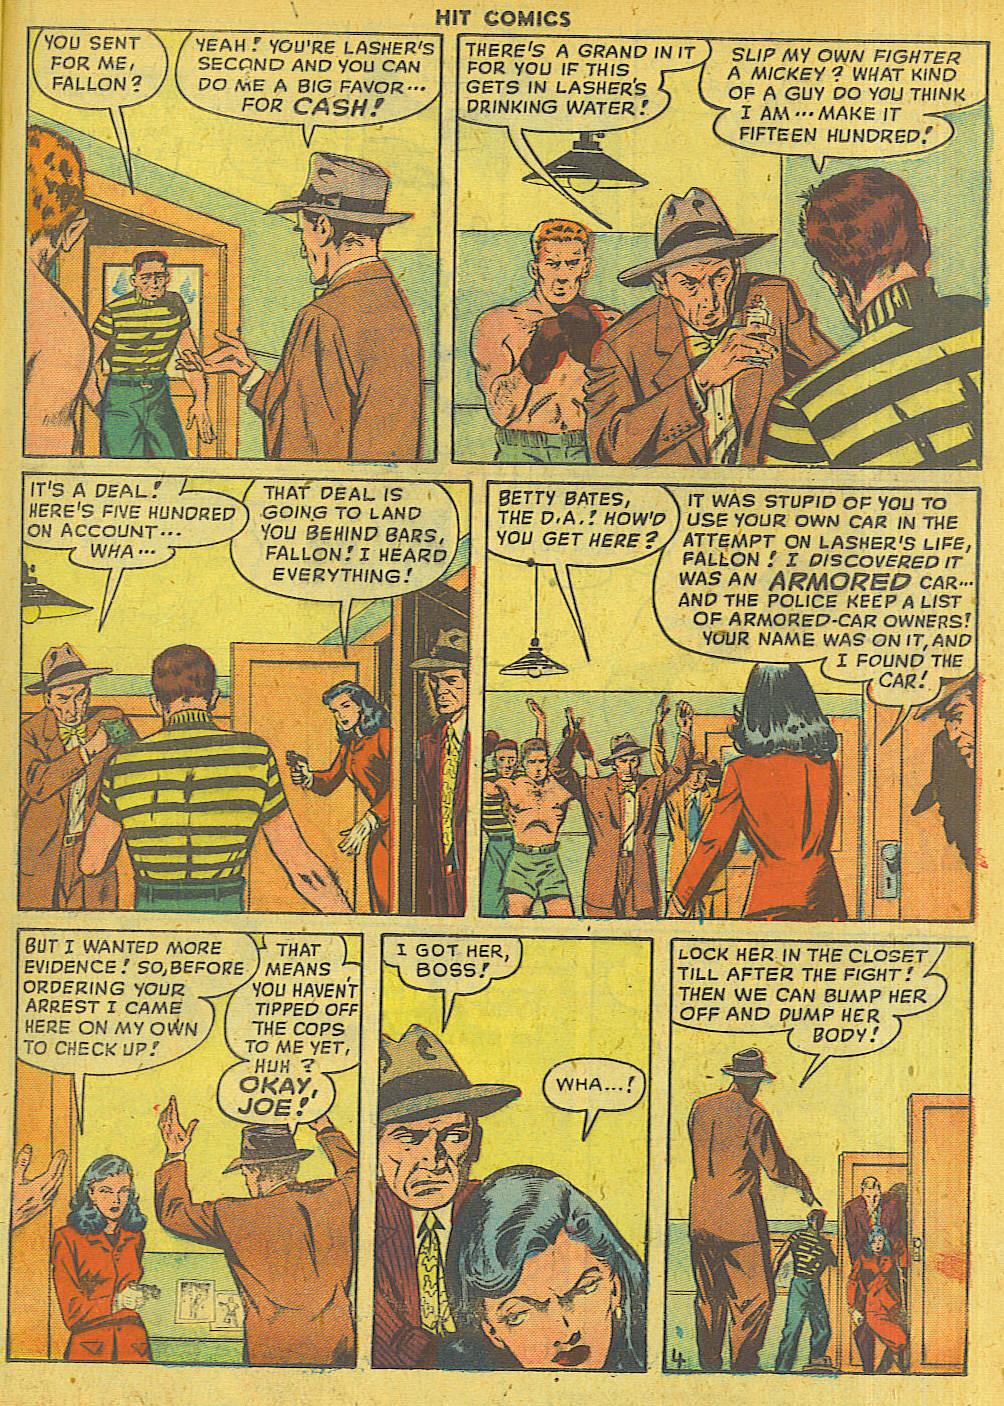 Read online Hit Comics comic -  Issue #56 - 35